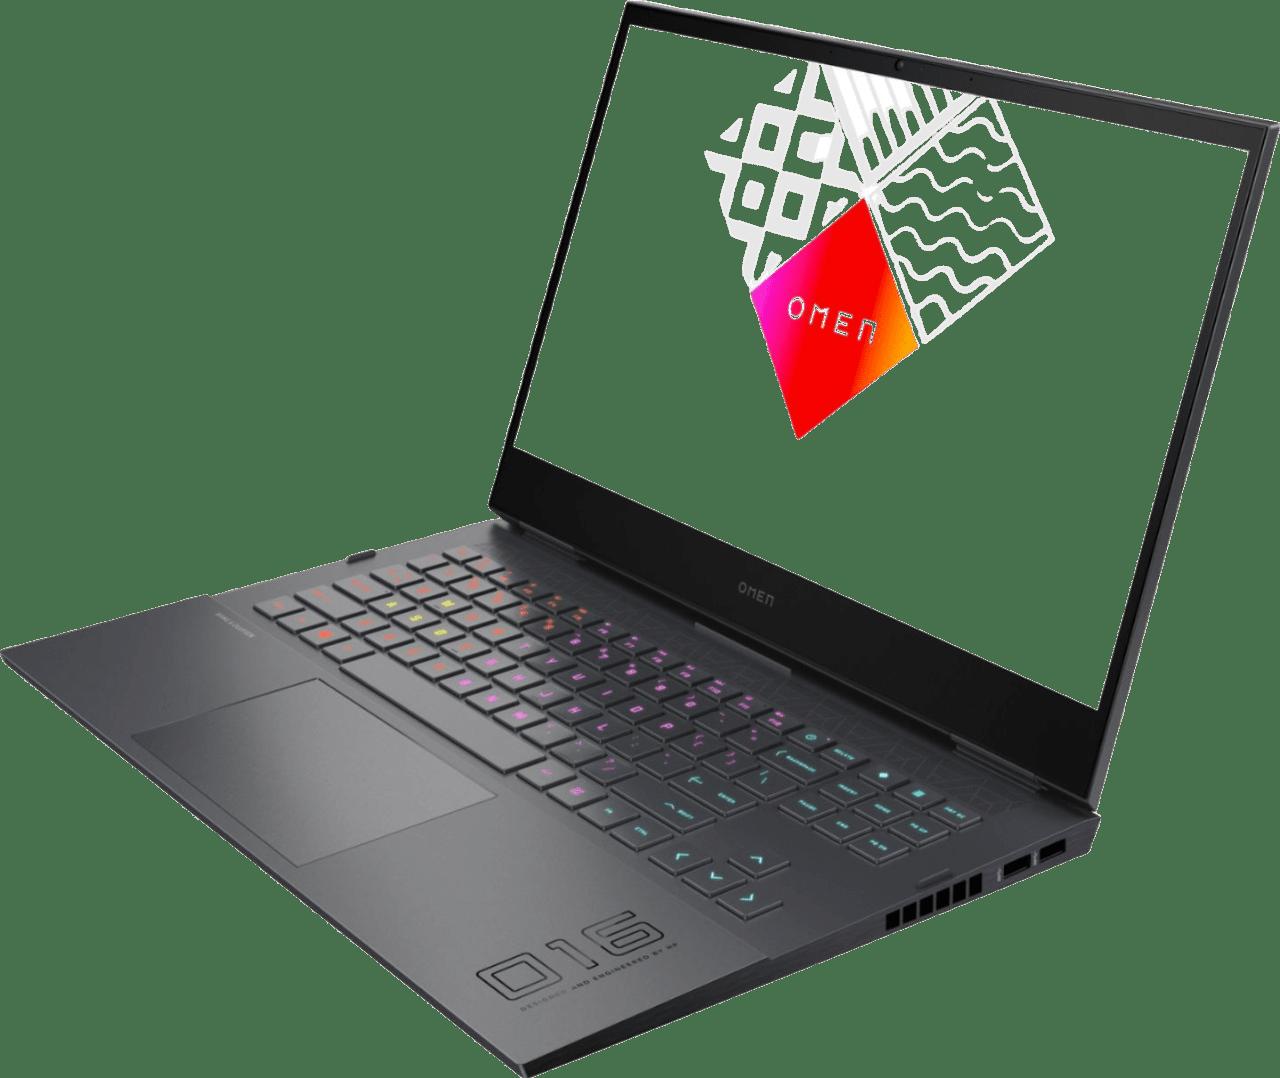 Black HP OMEN - Advantage Edition Laptop - AMD Ryzen 7 - 16GB - AMD Radeon™ RX 6600M - 1TB SSD.2